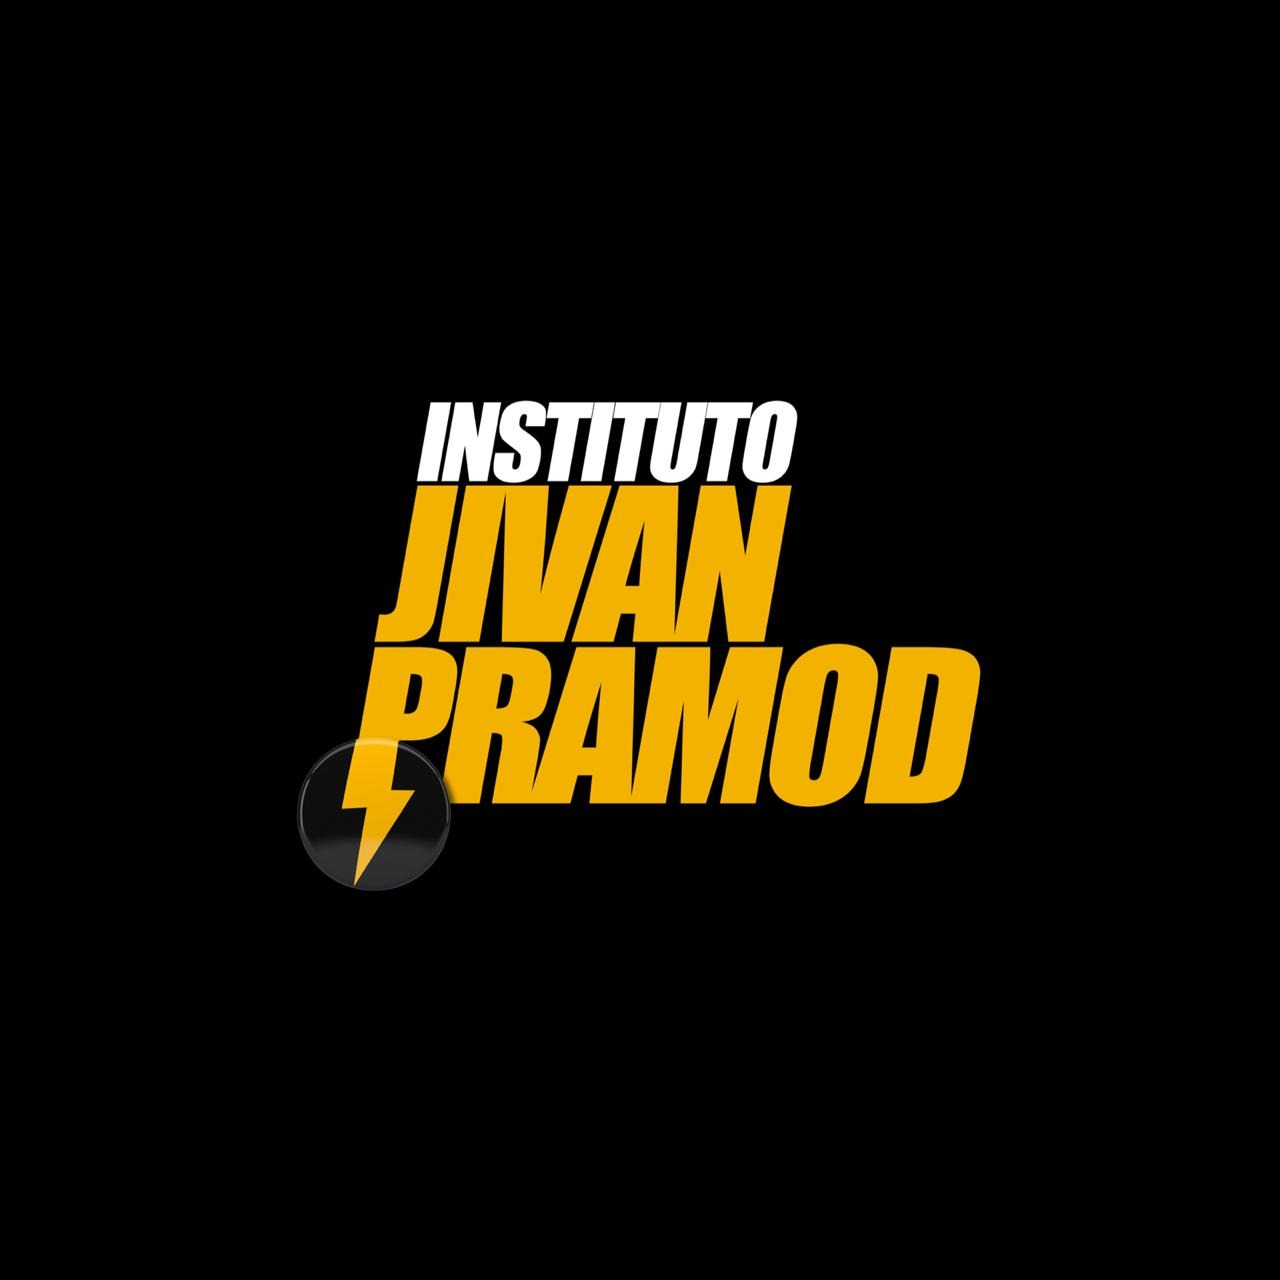 Instituto Jivan Pramod